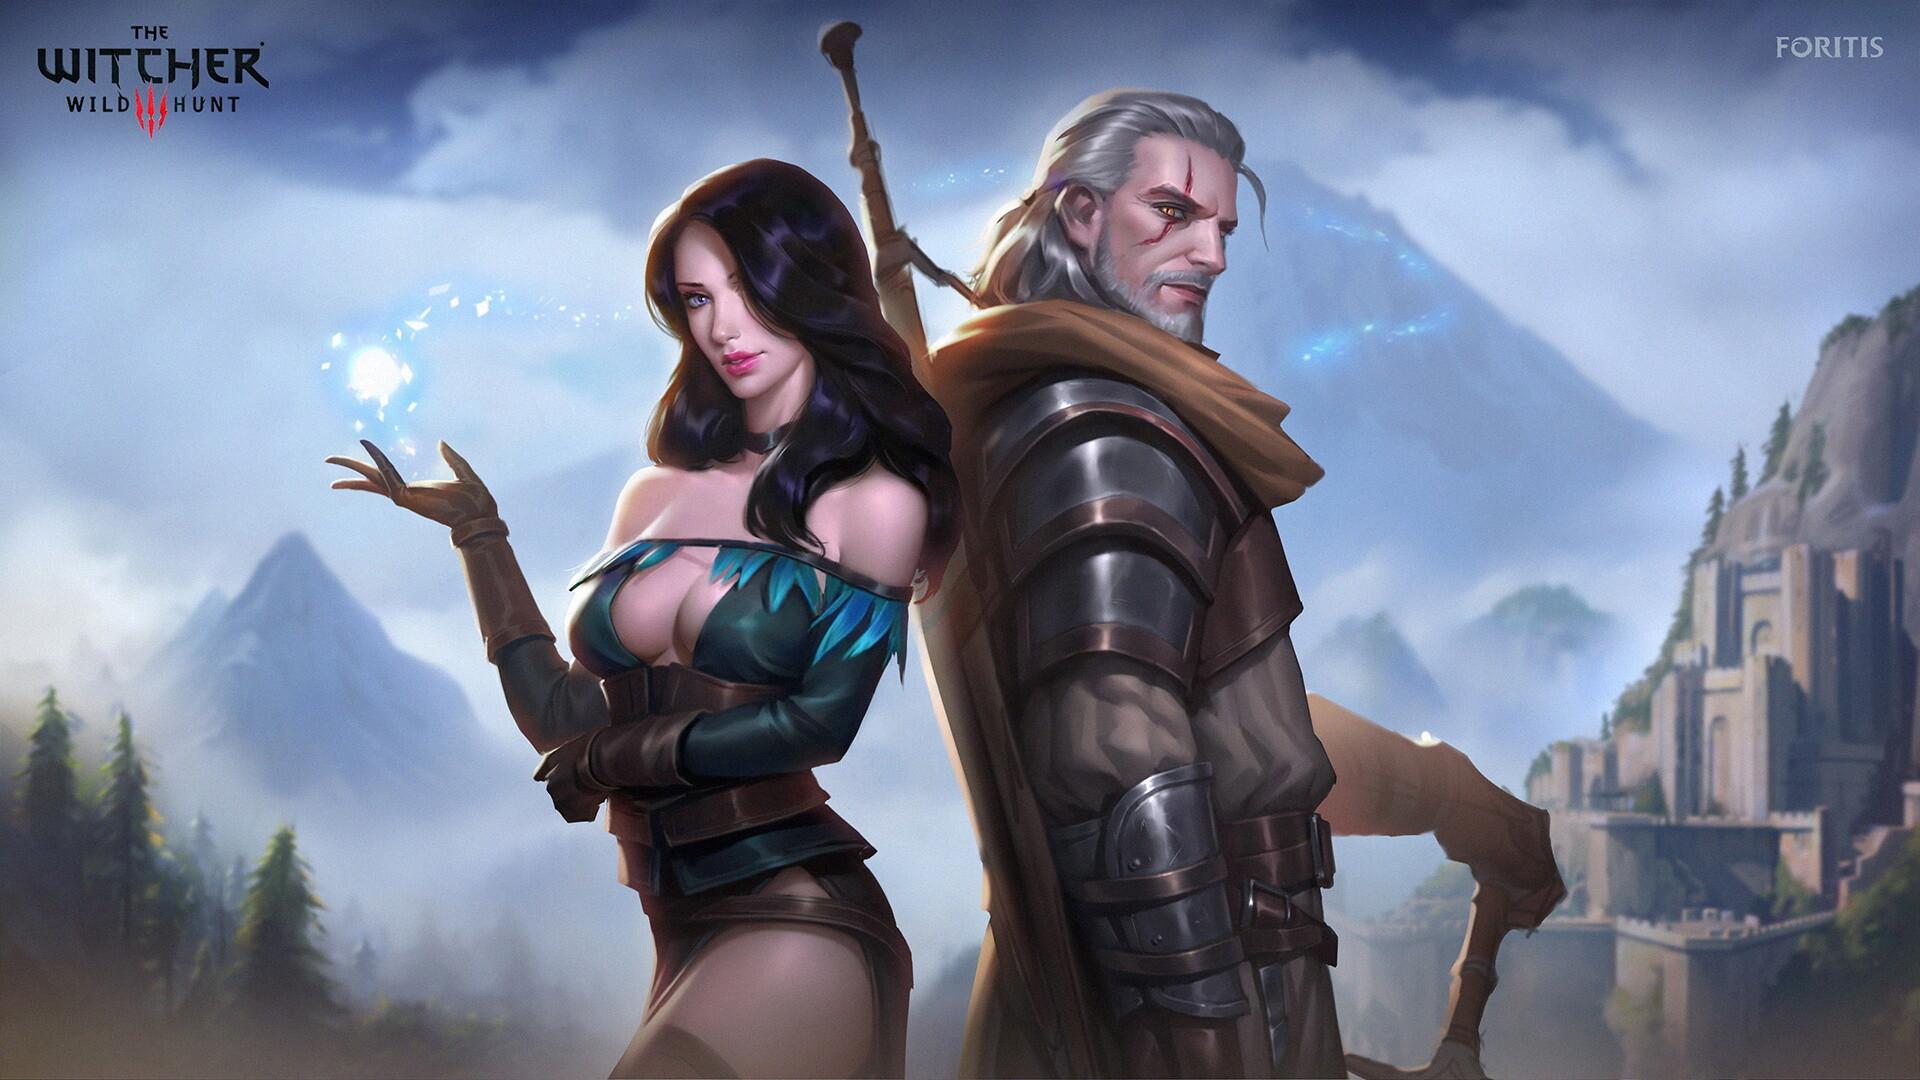 Artstation The Witcher Fanart Geralt Yennefer Foritis Wong